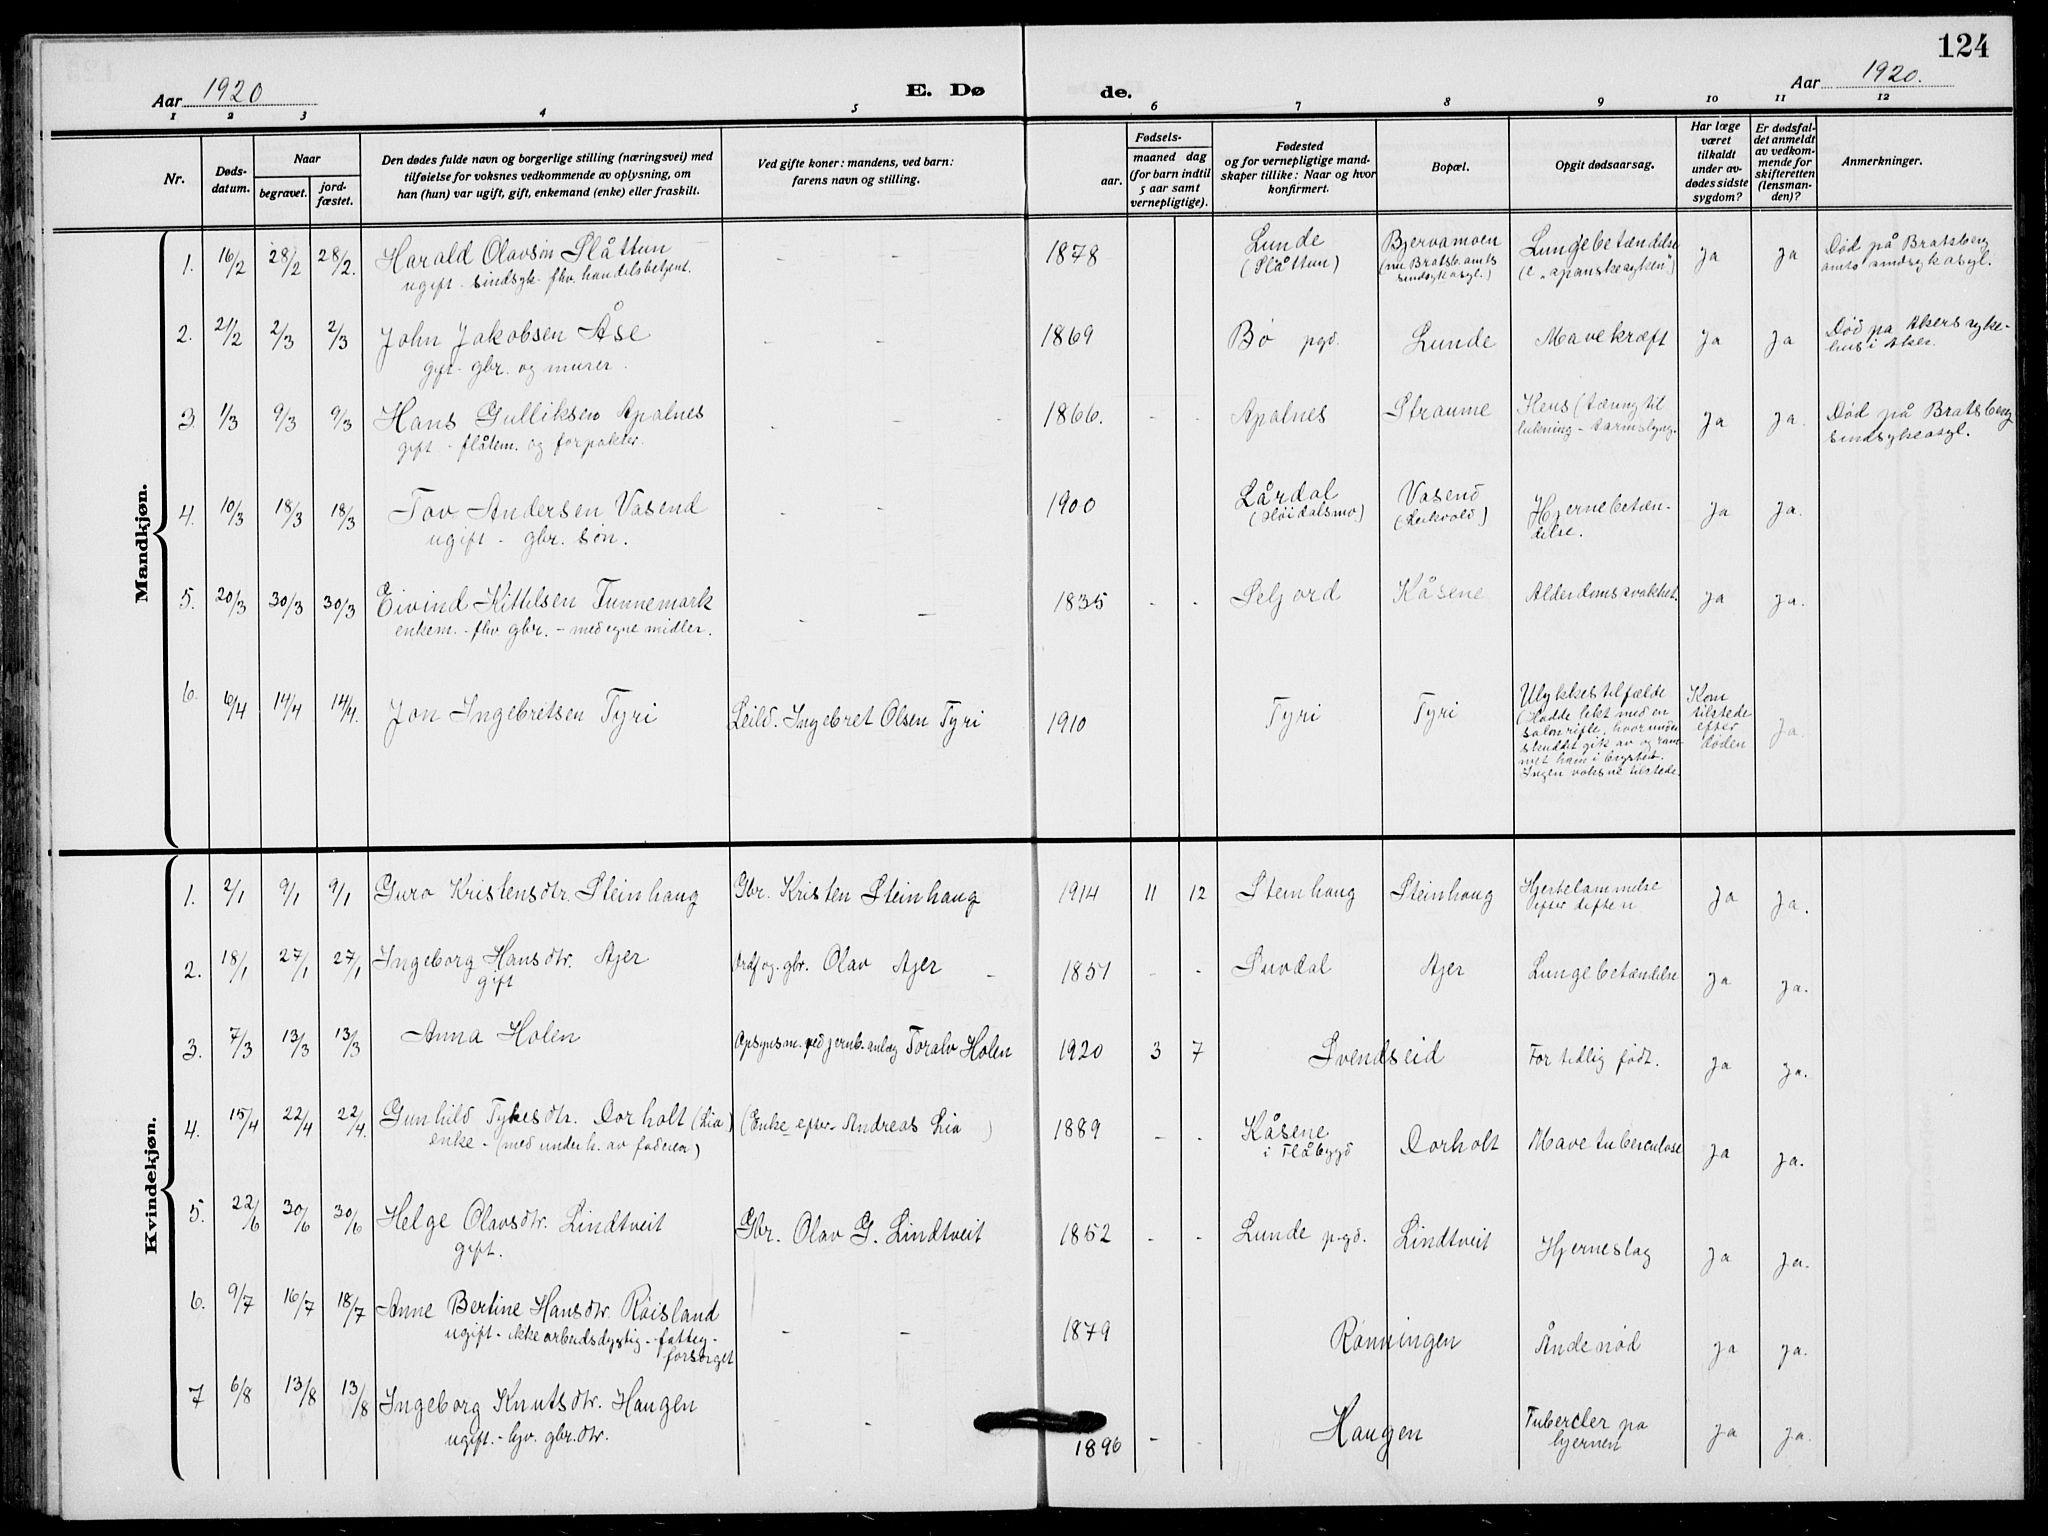 SAKO, Lunde kirkebøker, F/Fa/L0005: Ministerialbok nr. I 5, 1914-1922, s. 124